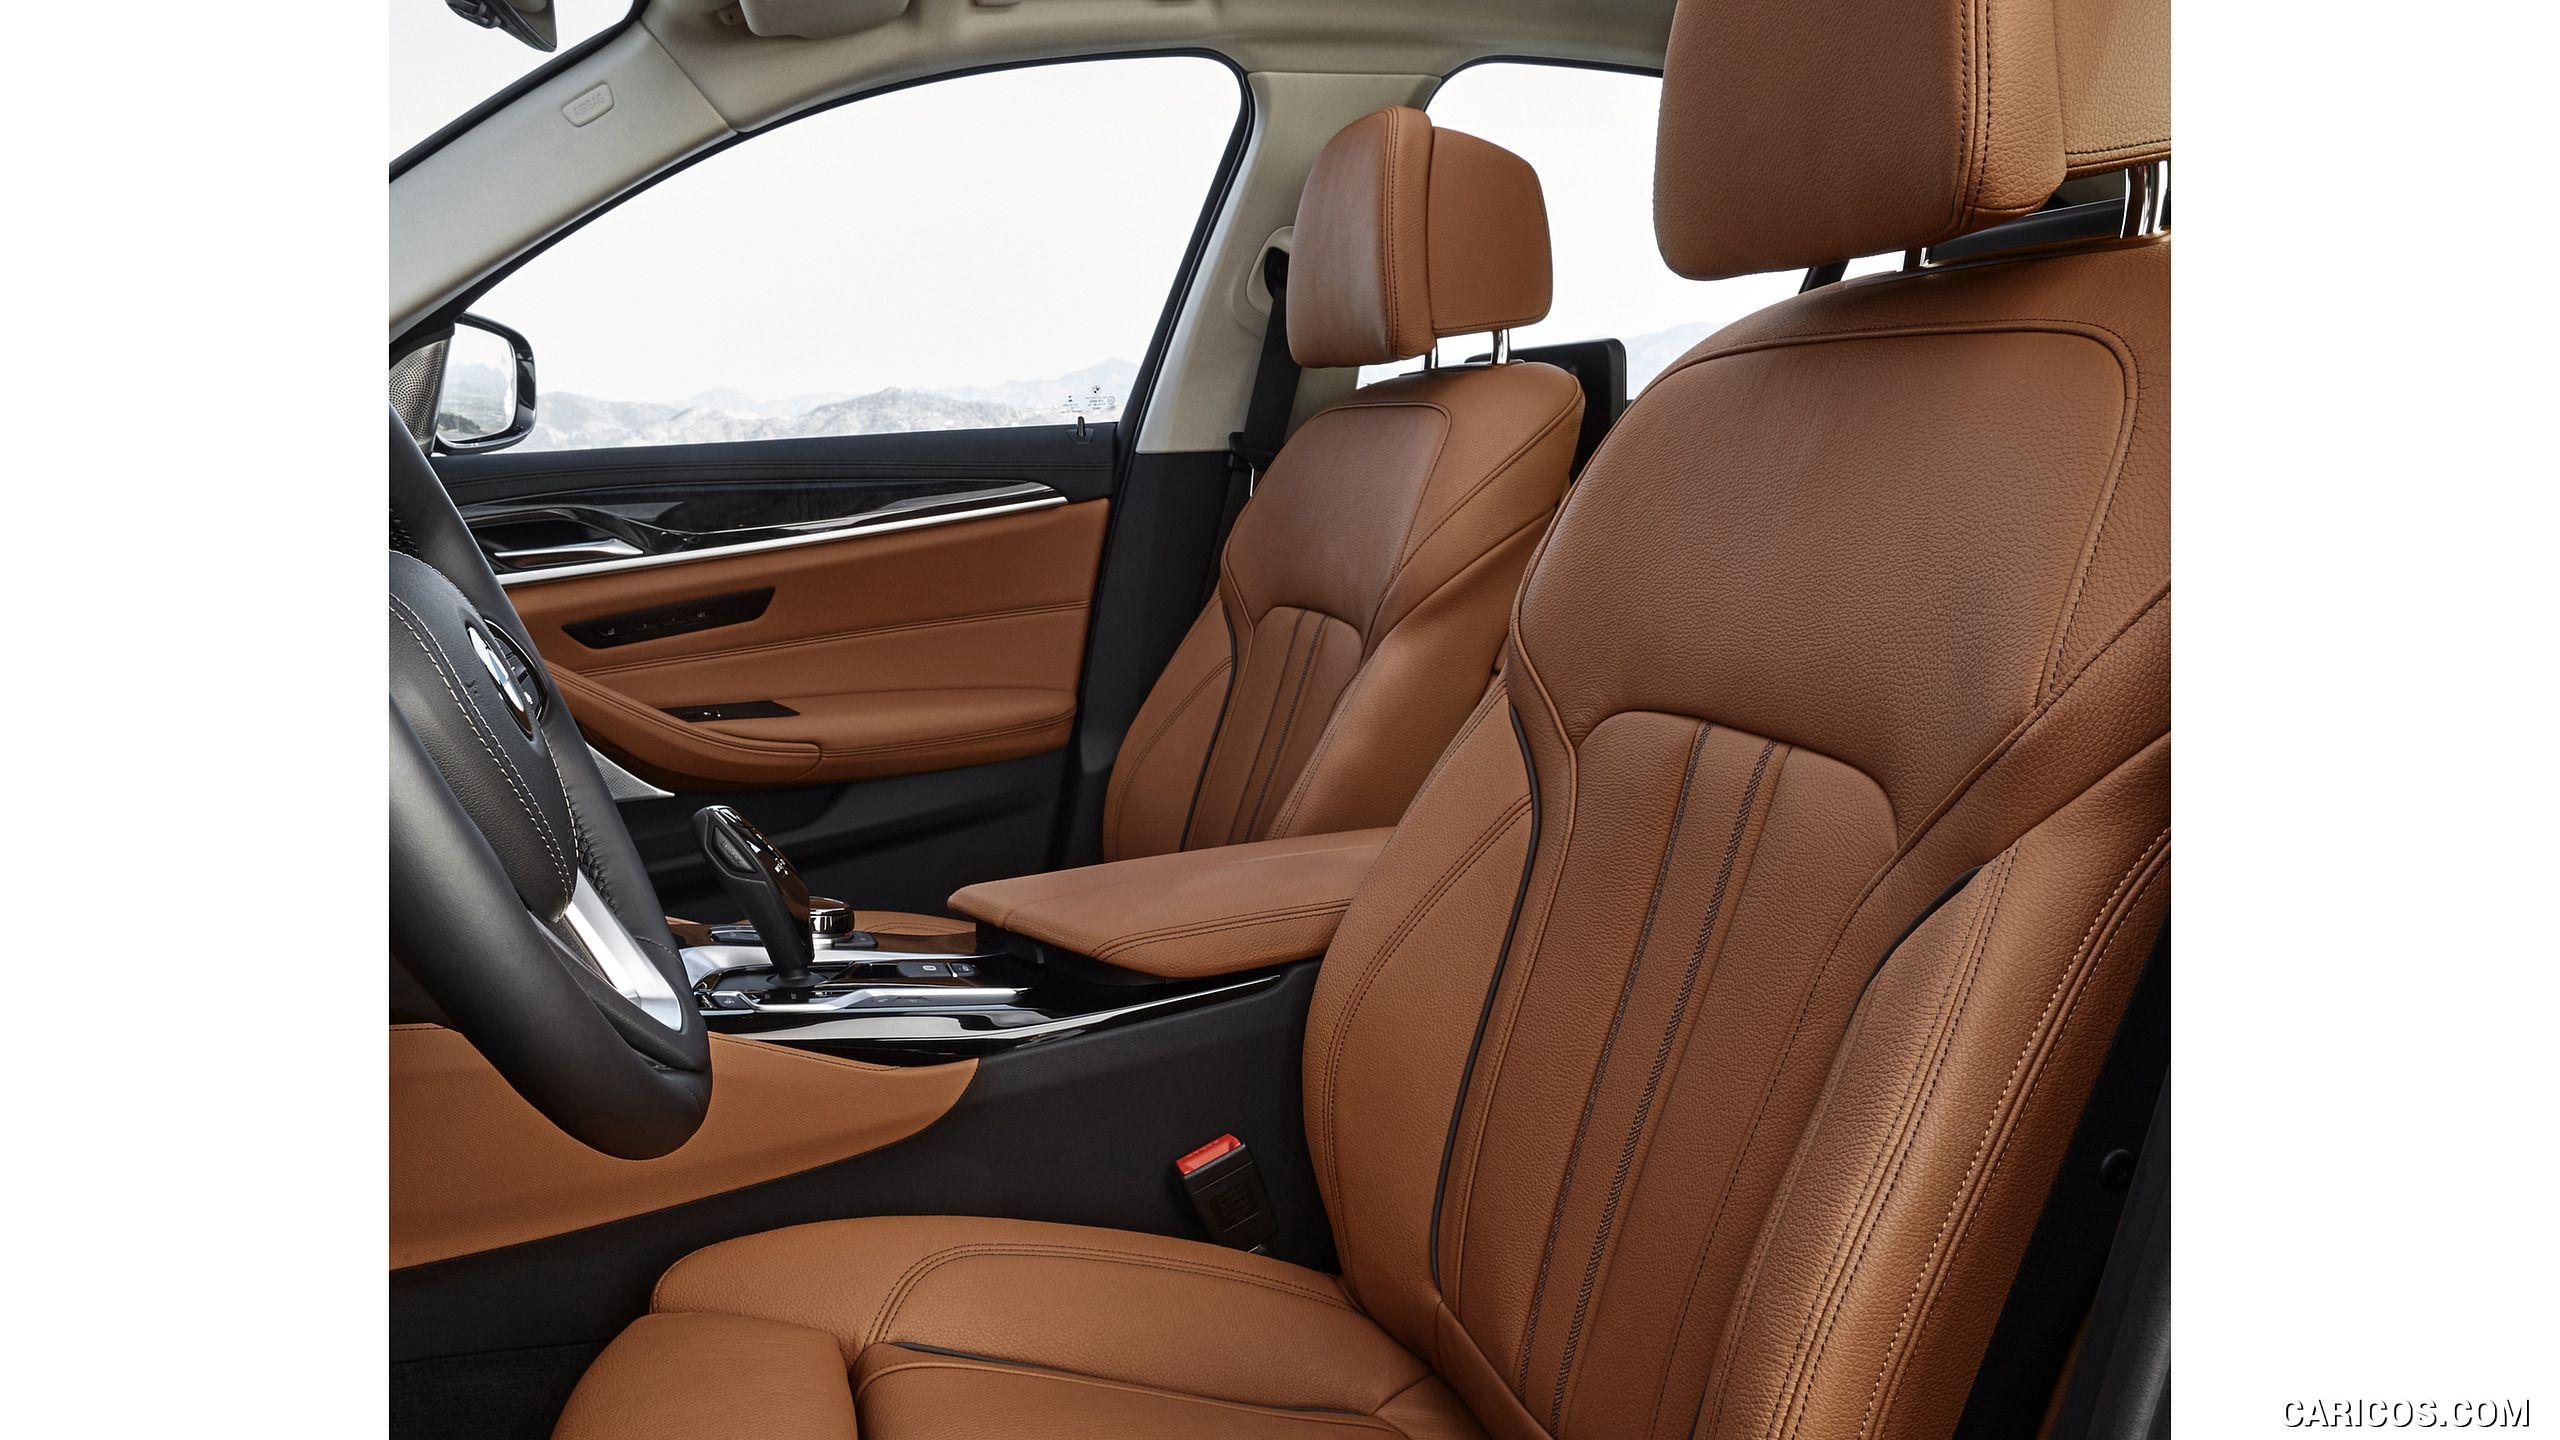 2017 Bmw 5 Series 530d Xdrive Diesel Luxury Line Interior Front